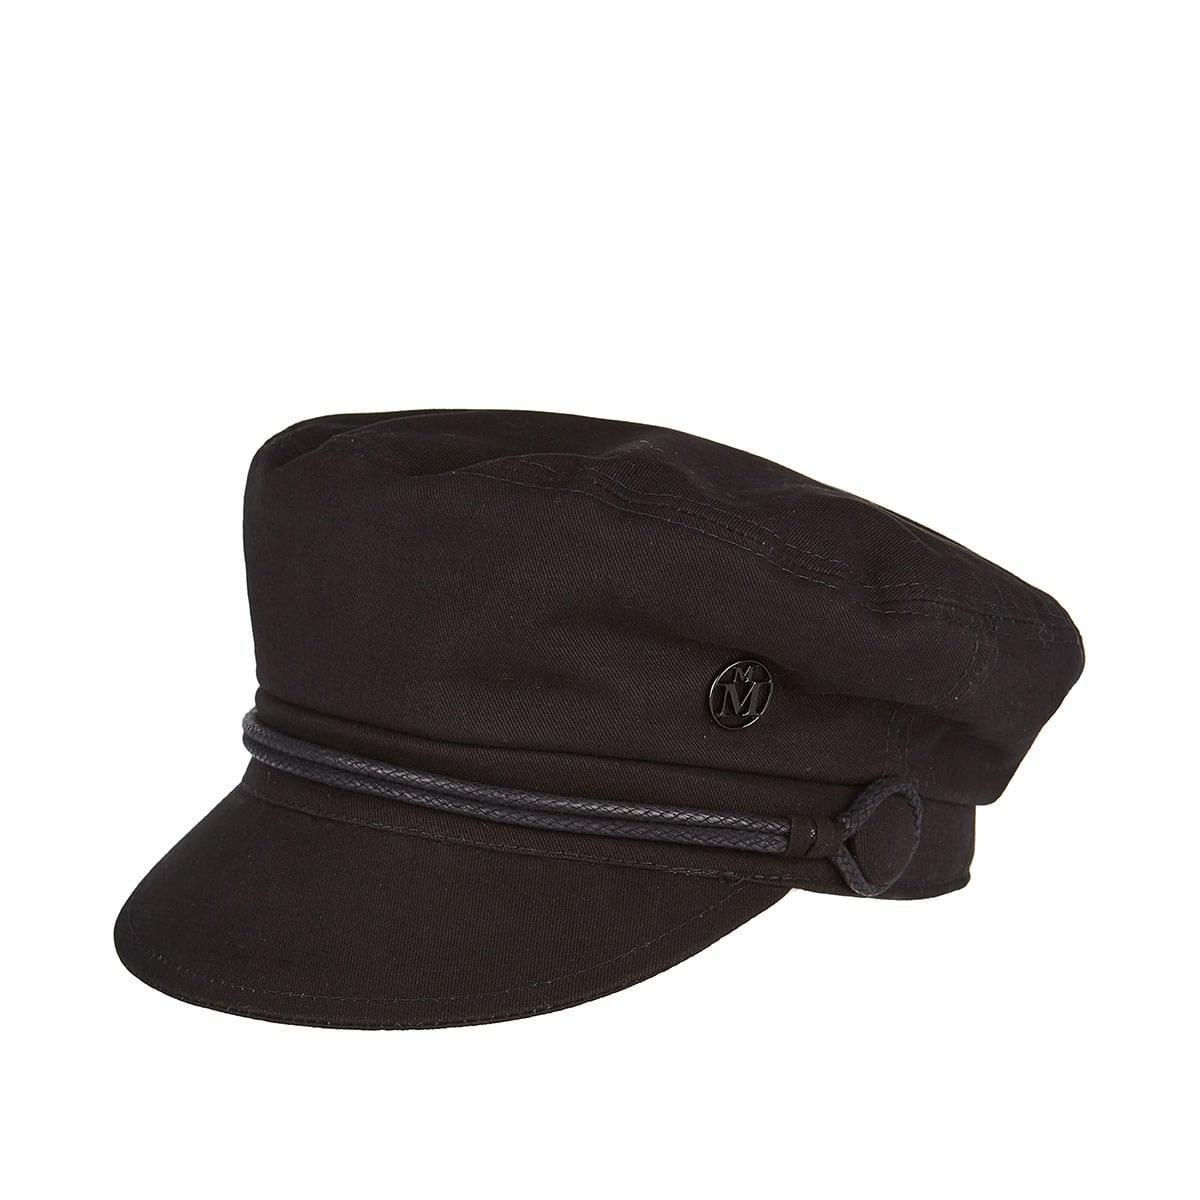 New Abby cotton cap